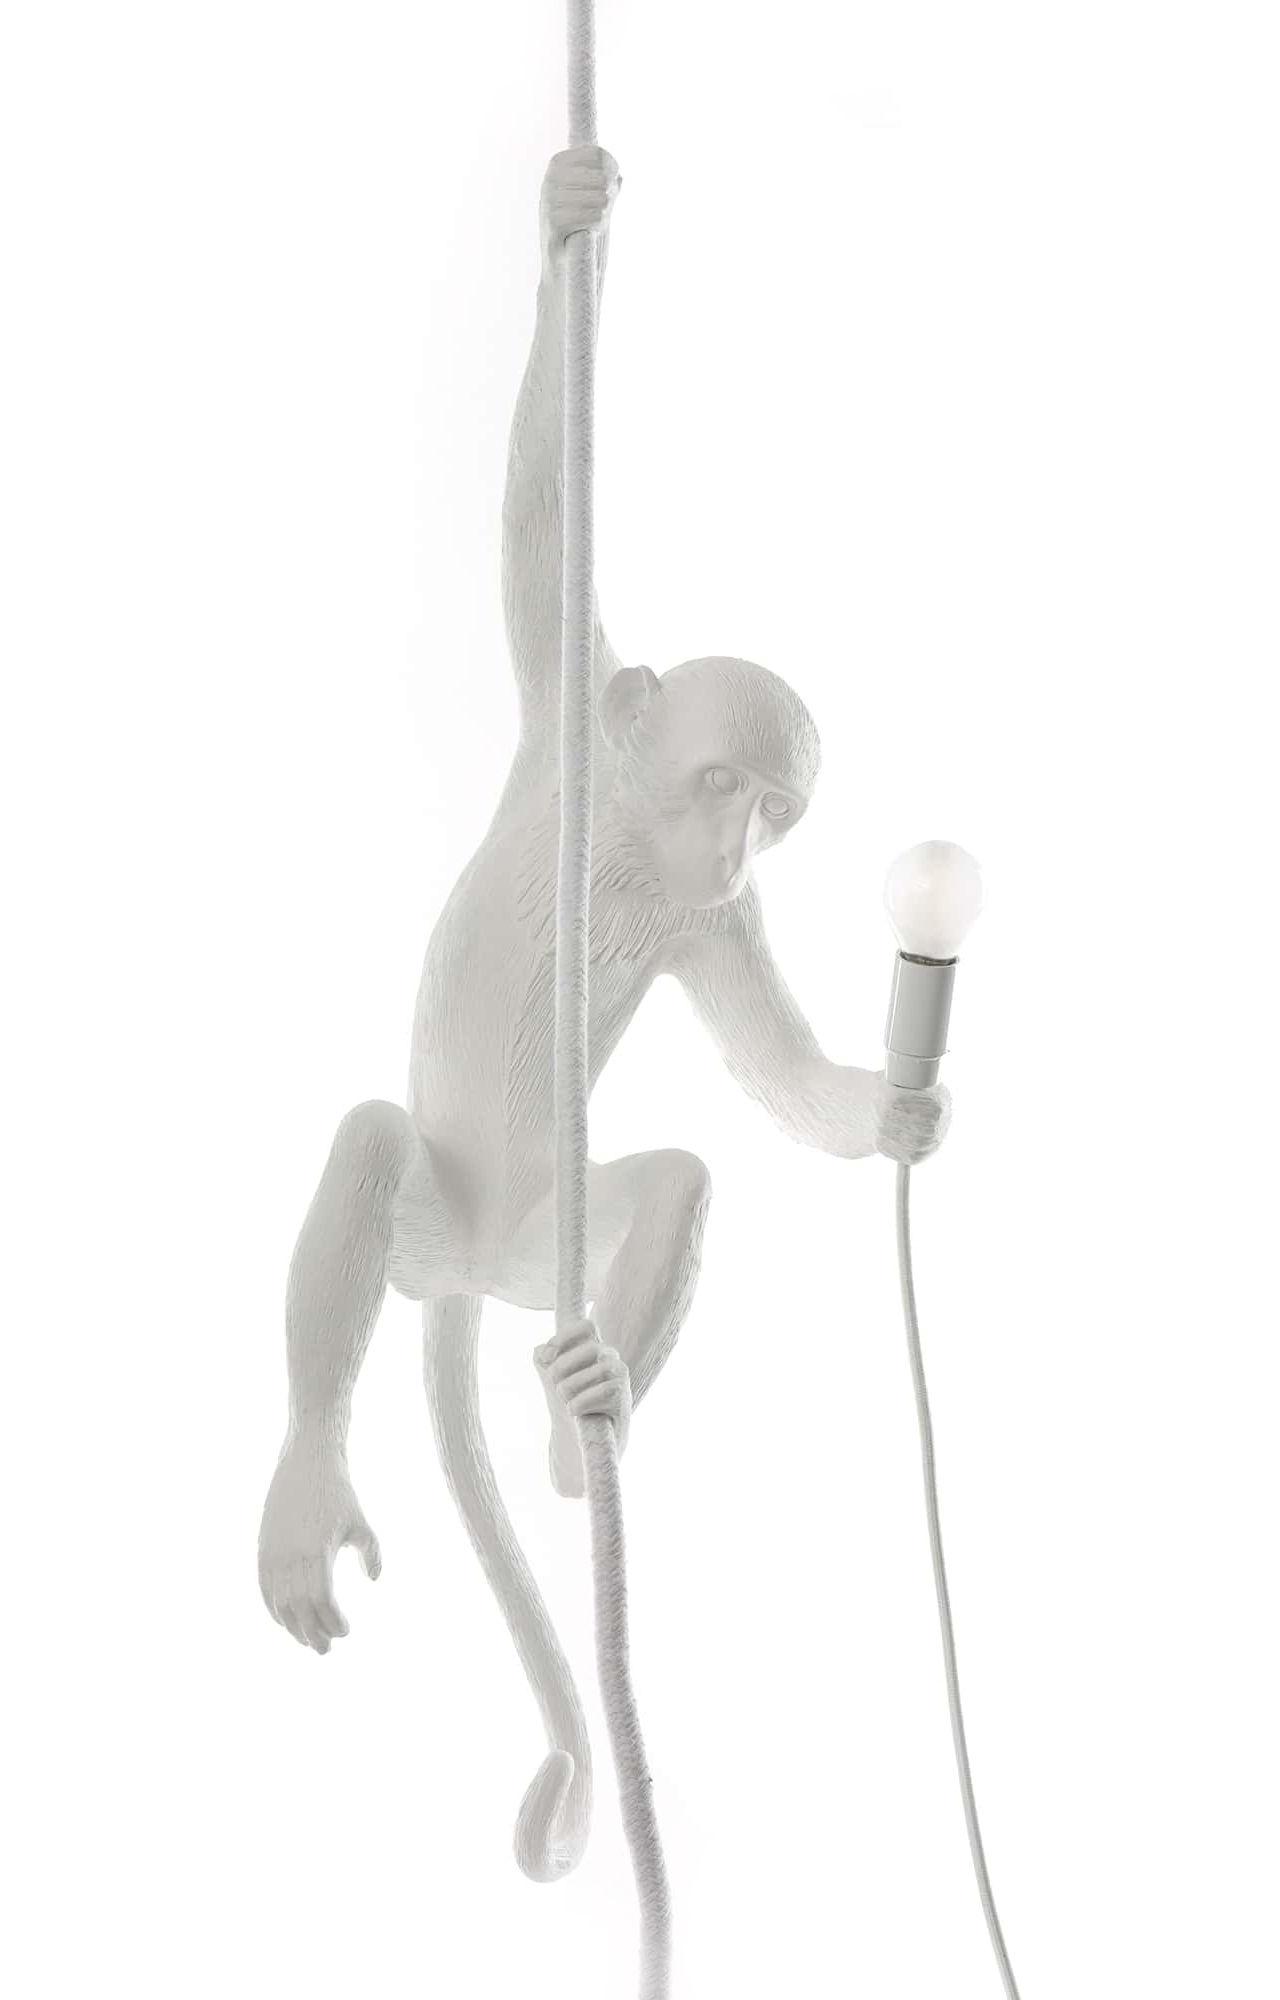 Illuminazione - Lampadari - Sospensione Monkey Hanging - / Outdoor - H 80 cm di Seletti - Bianco - Resina